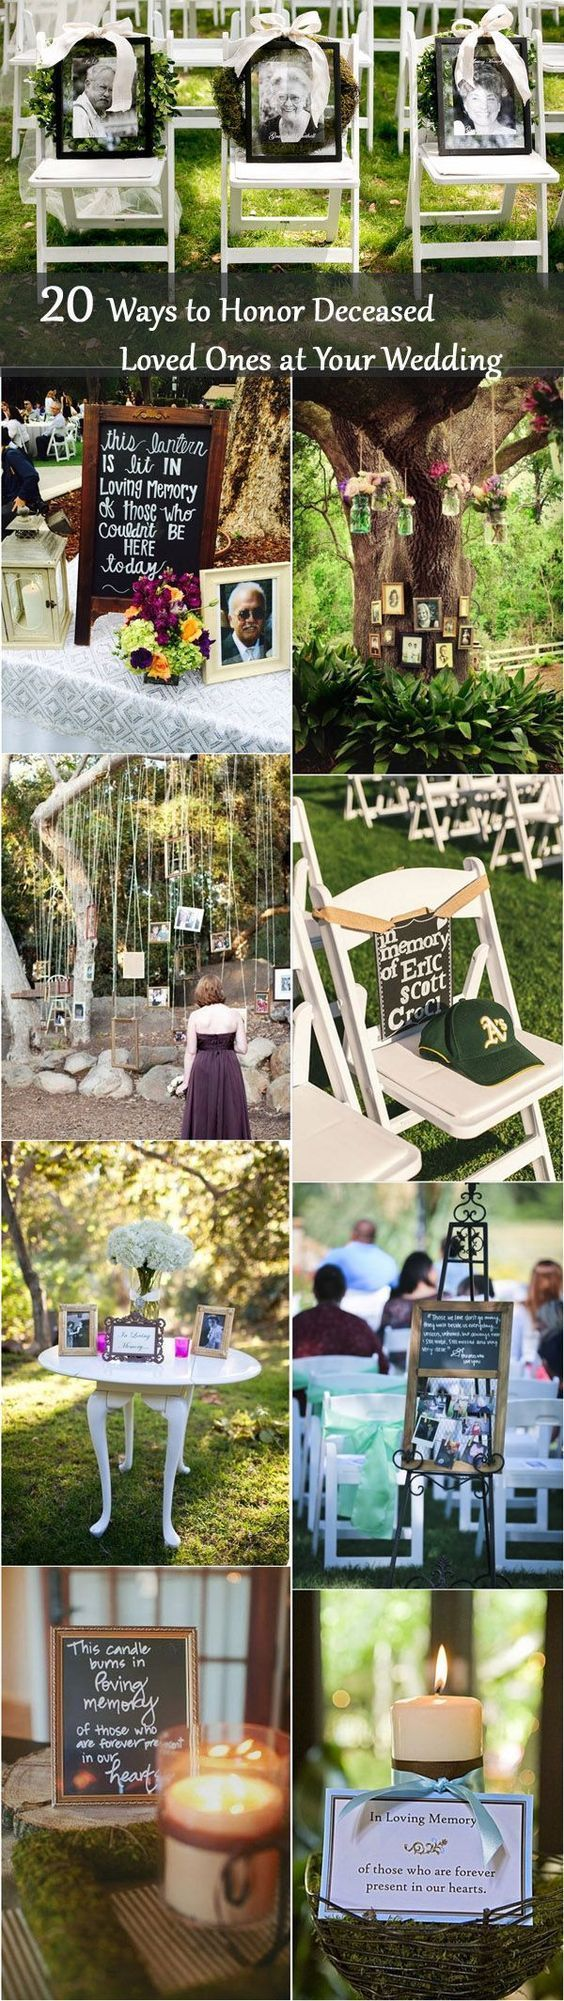 Wedding decorations unique  unique wedding ideas to honor lost loved ones